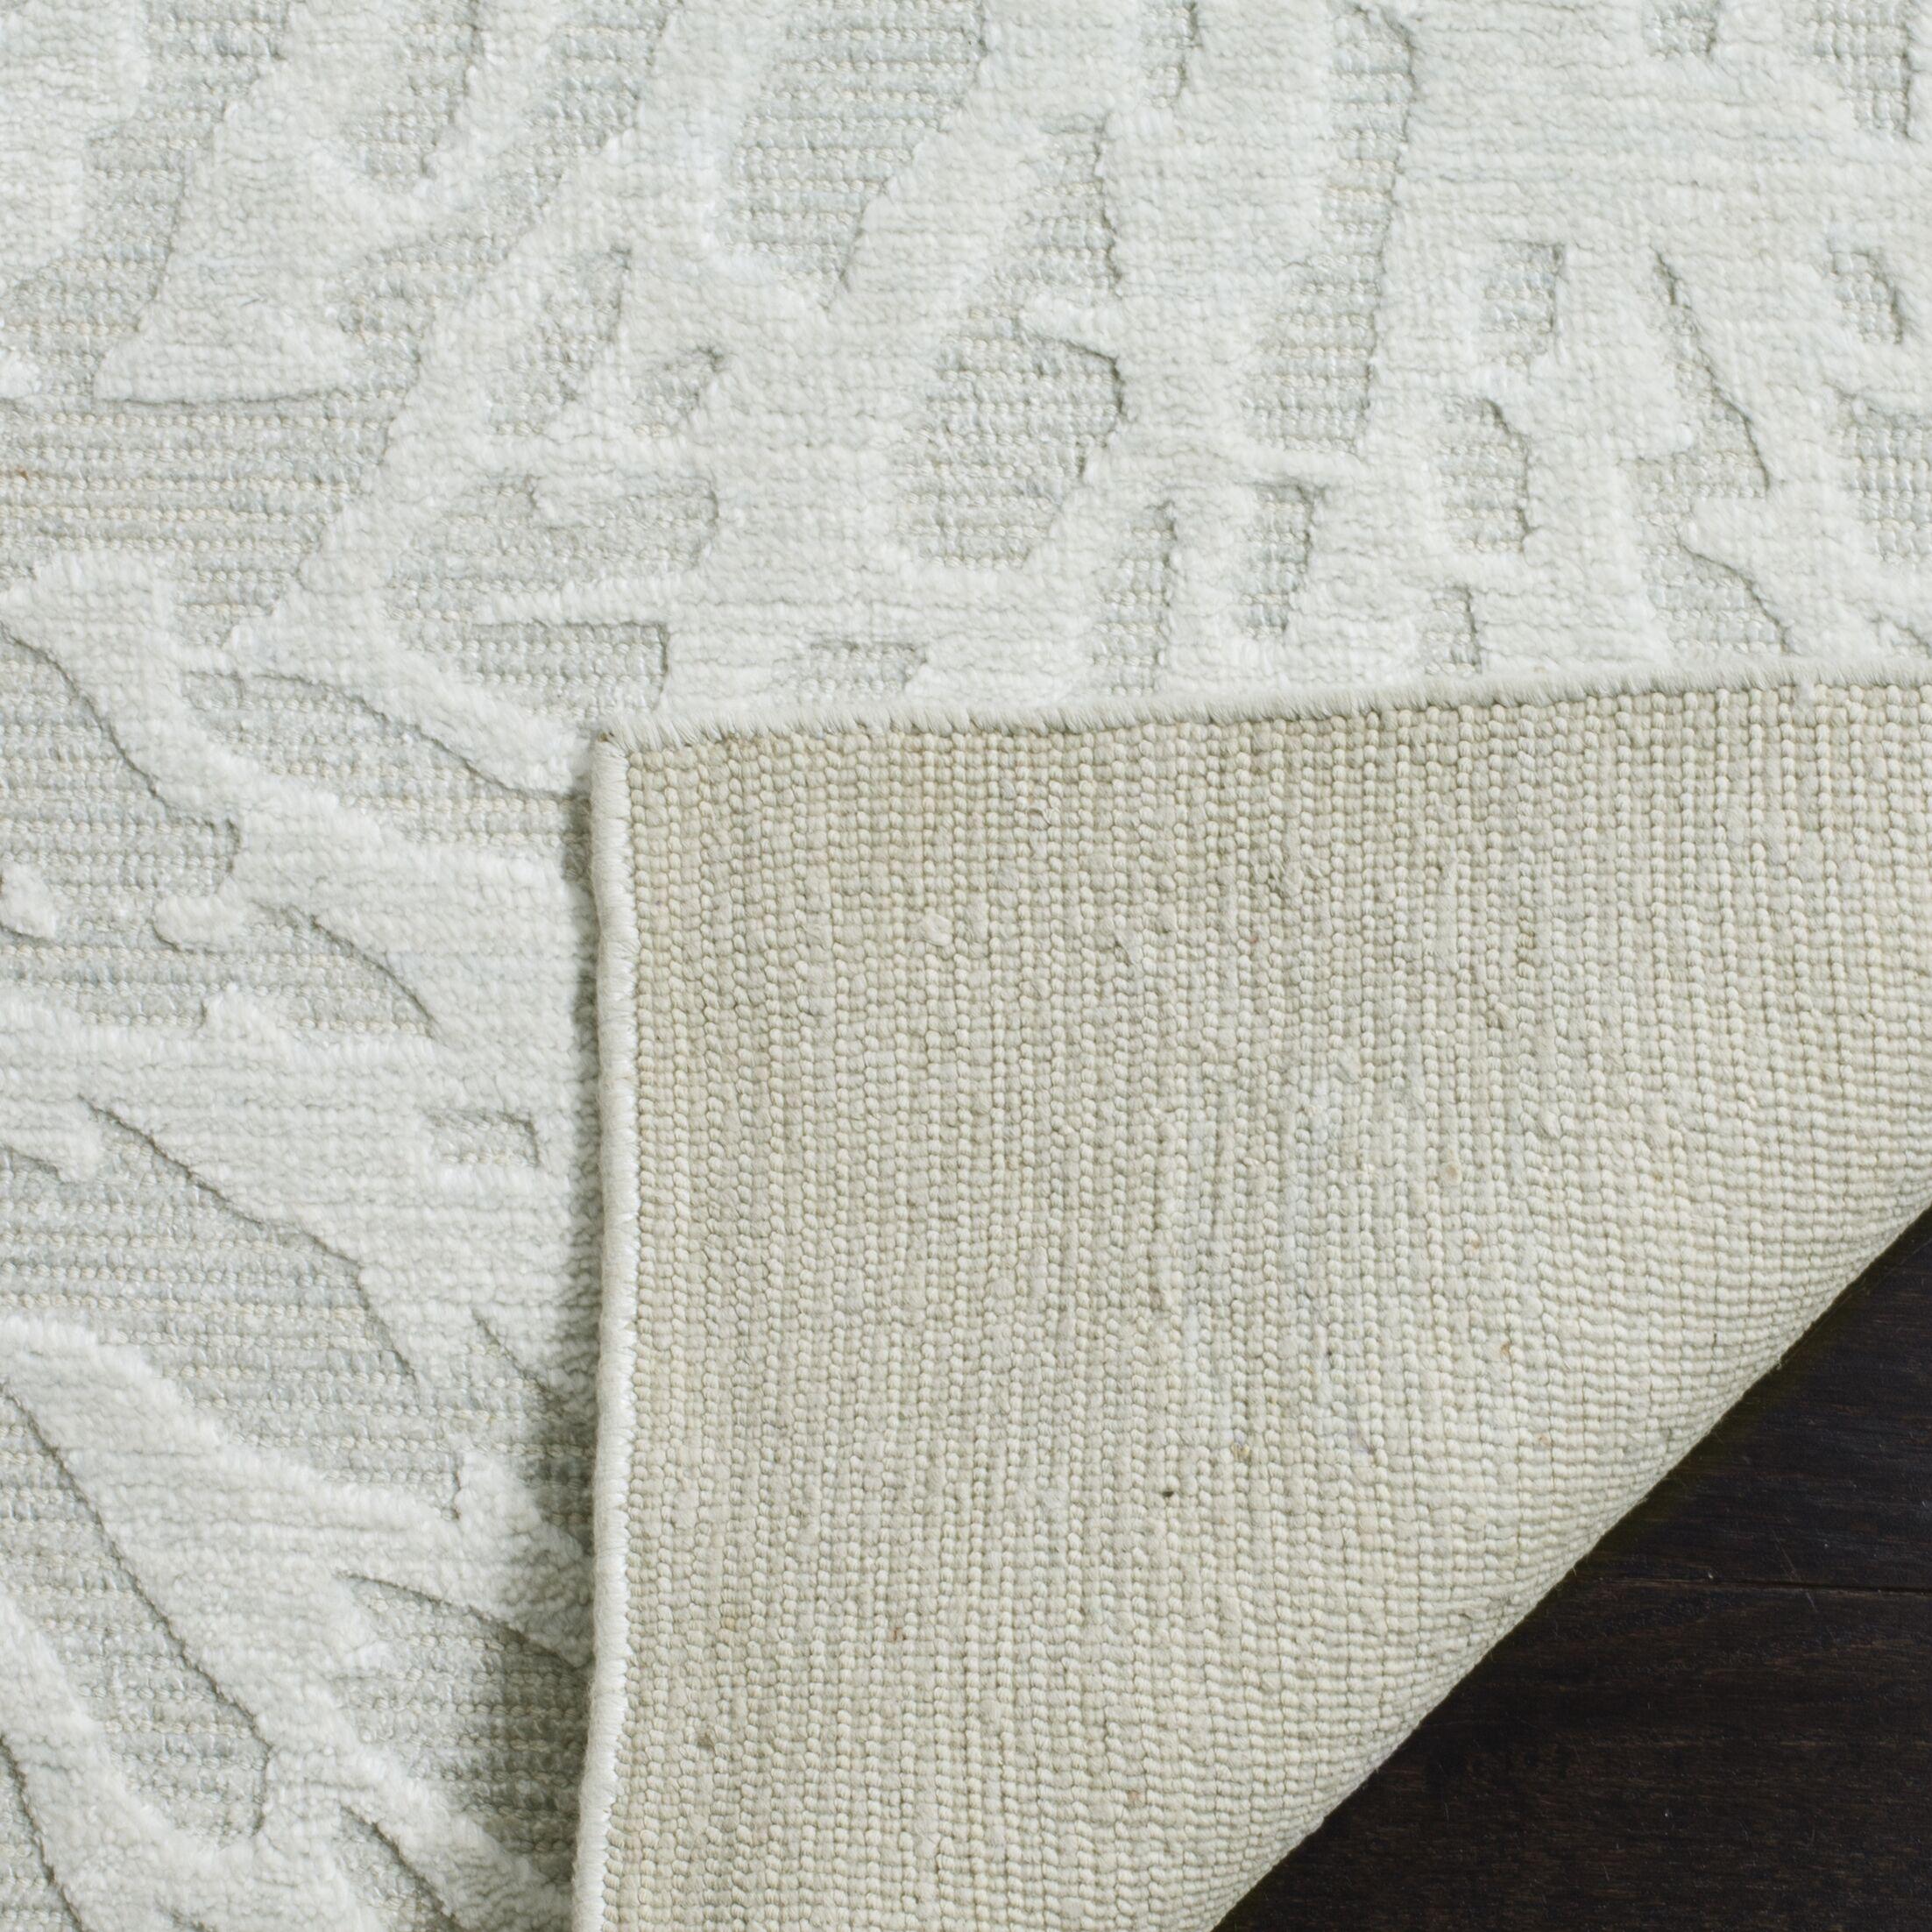 Juhi Hand Tufted Light Gray Area Rug Rug Size: Rectangle 8' x 10'